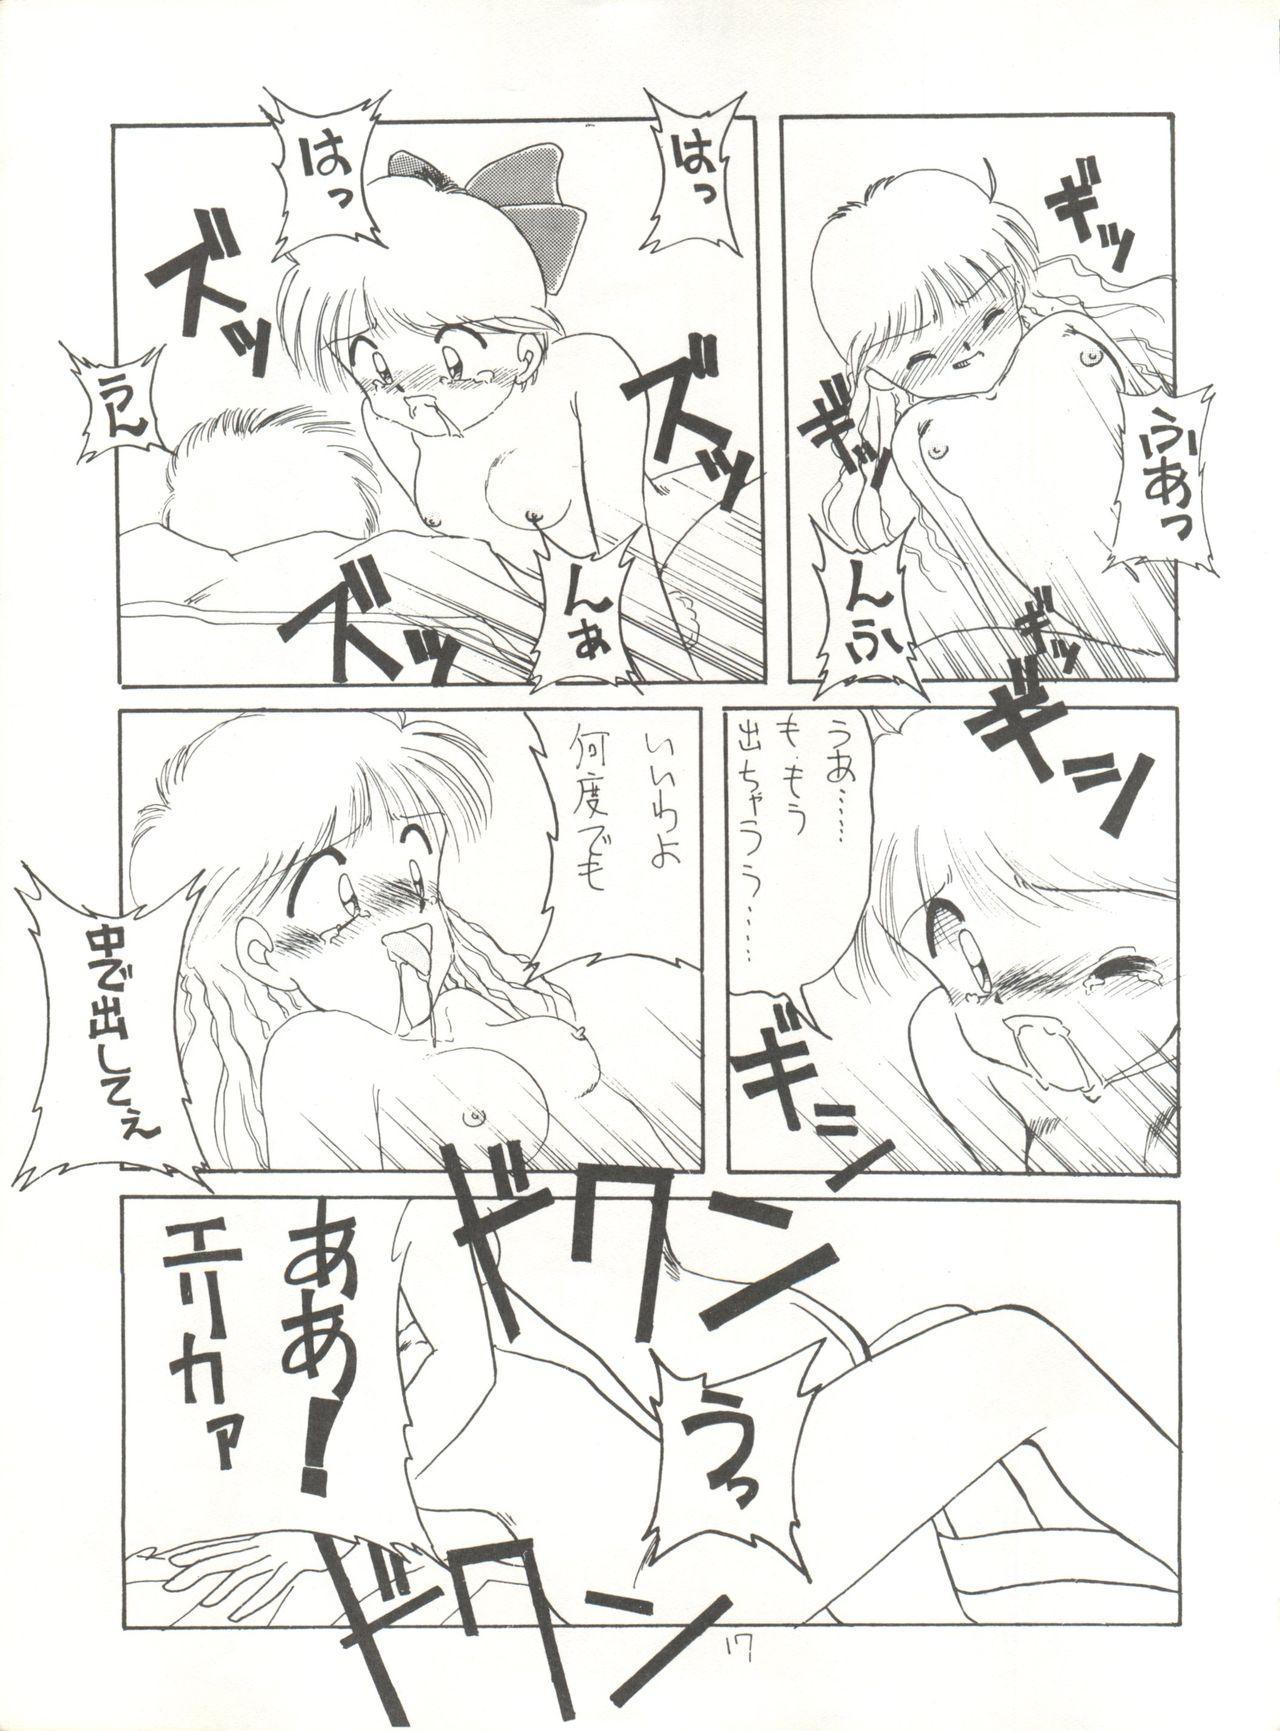 [Global One (MARO)] Sadistic 5 (Cutey Honey, Devilman, Sailor Moon), [Global One (MARO)] Sadistic (Dirty Pair, Fushigi no Umi no Nadia, Sailor Moon), [Studio Ikkatsumajin] .ribbon (Hime-chan's Ribbon) 140